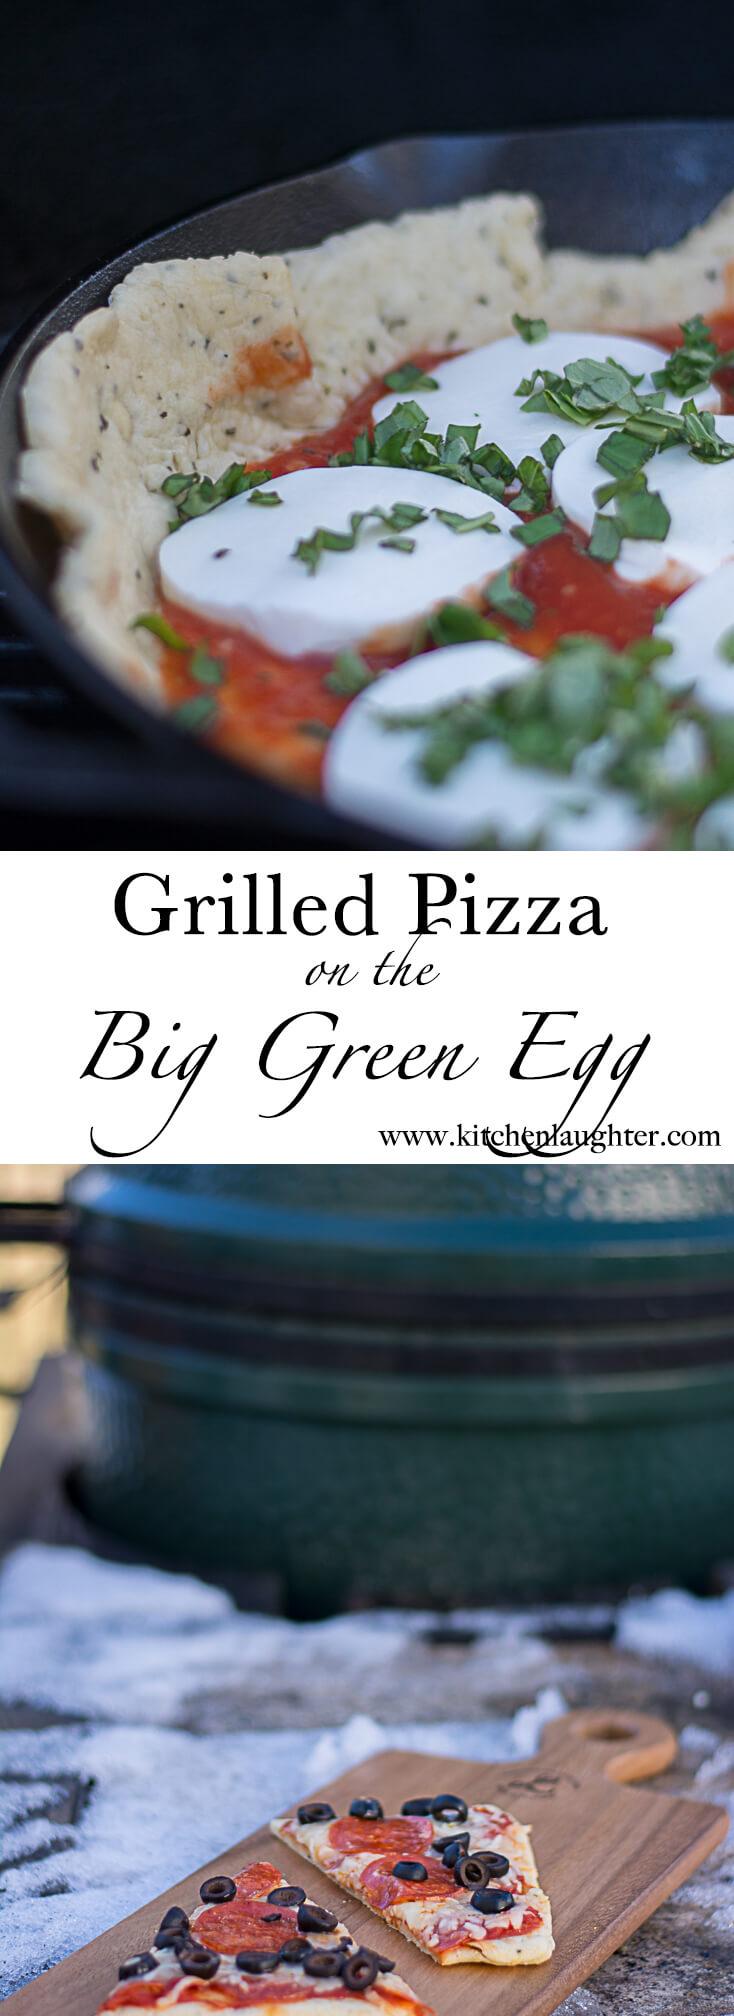 Grilled Pizza Big Green Egg #CastIron #Pizza #Grill #BGE #BigGreenEgg #GrilledPizza